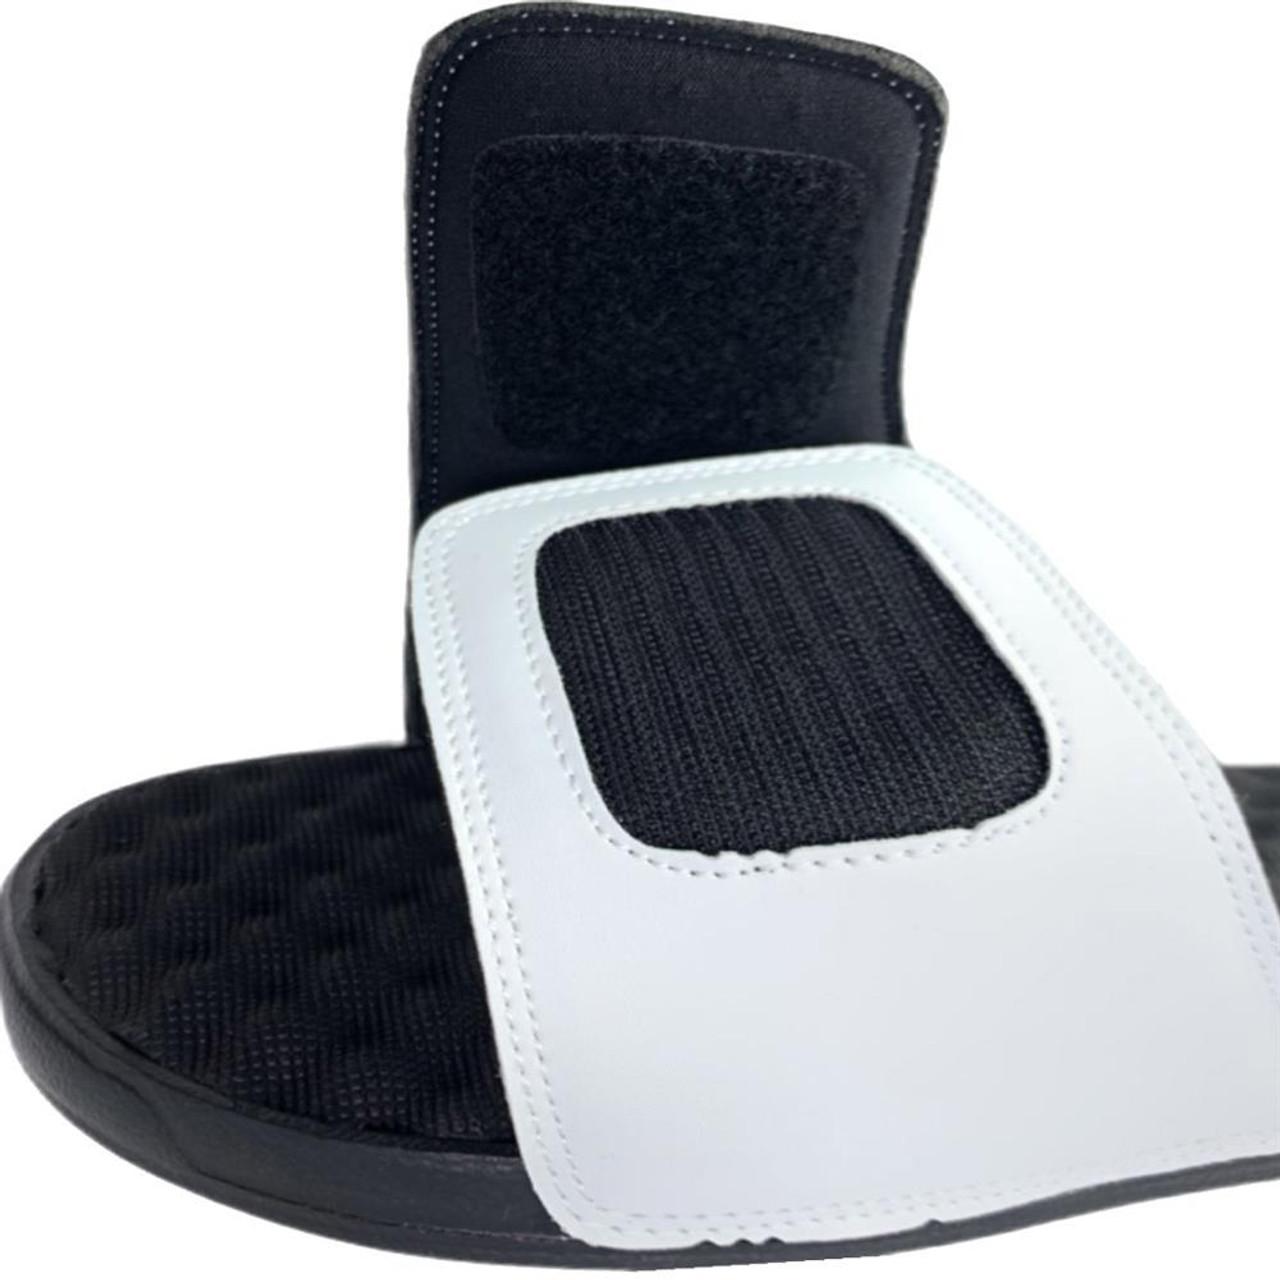 Cleveland Cavaliers Slides ISlide Primary Adjustable Sandals